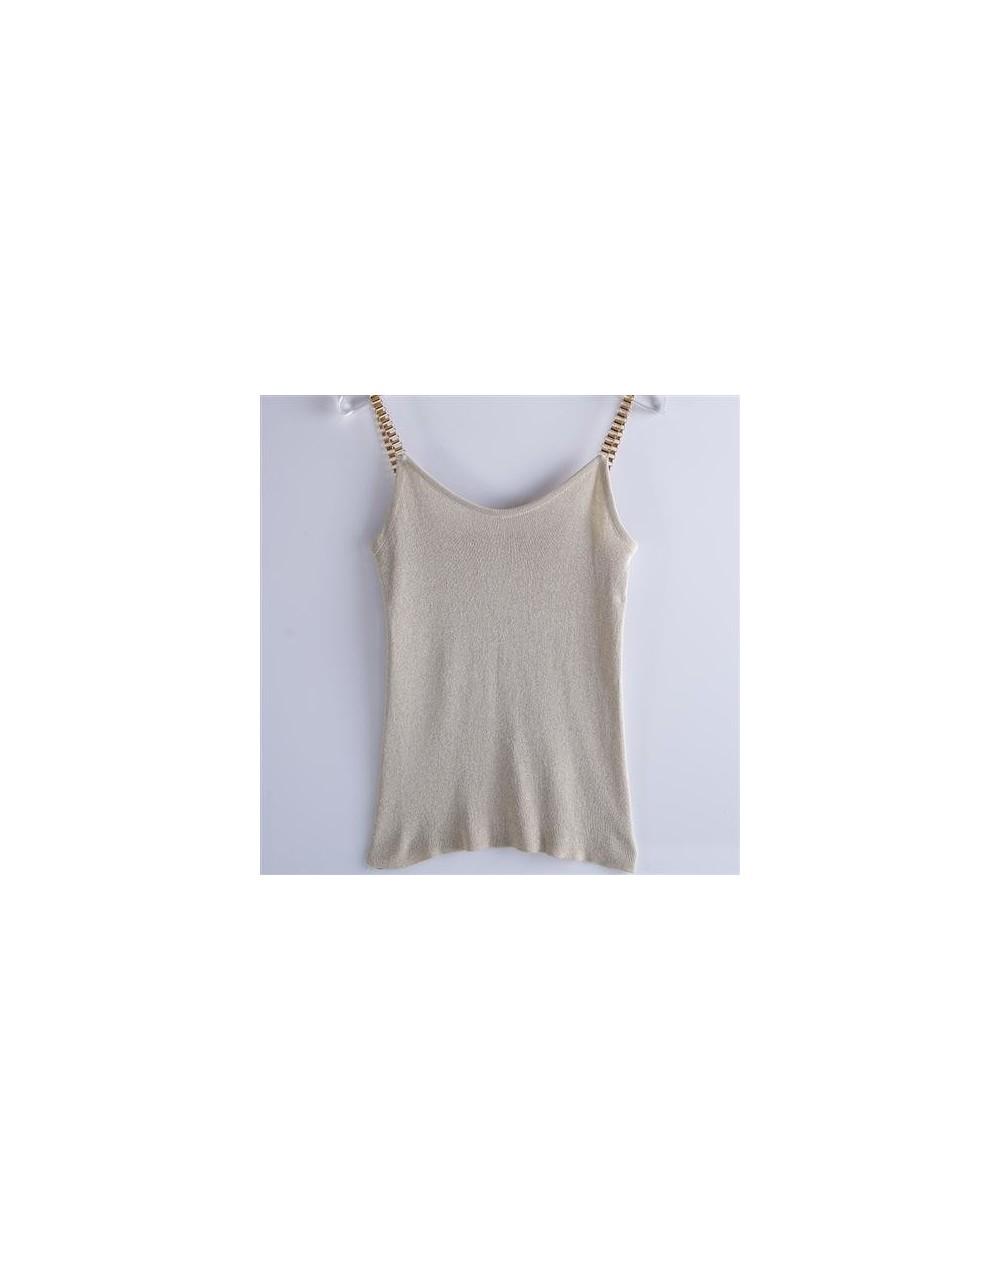 New summer Women Glitter Tank Tops Female V-Neck Knitted Camisole Sleeveless Bling tops Sexy joker solid Vest - Beige - 4U41...